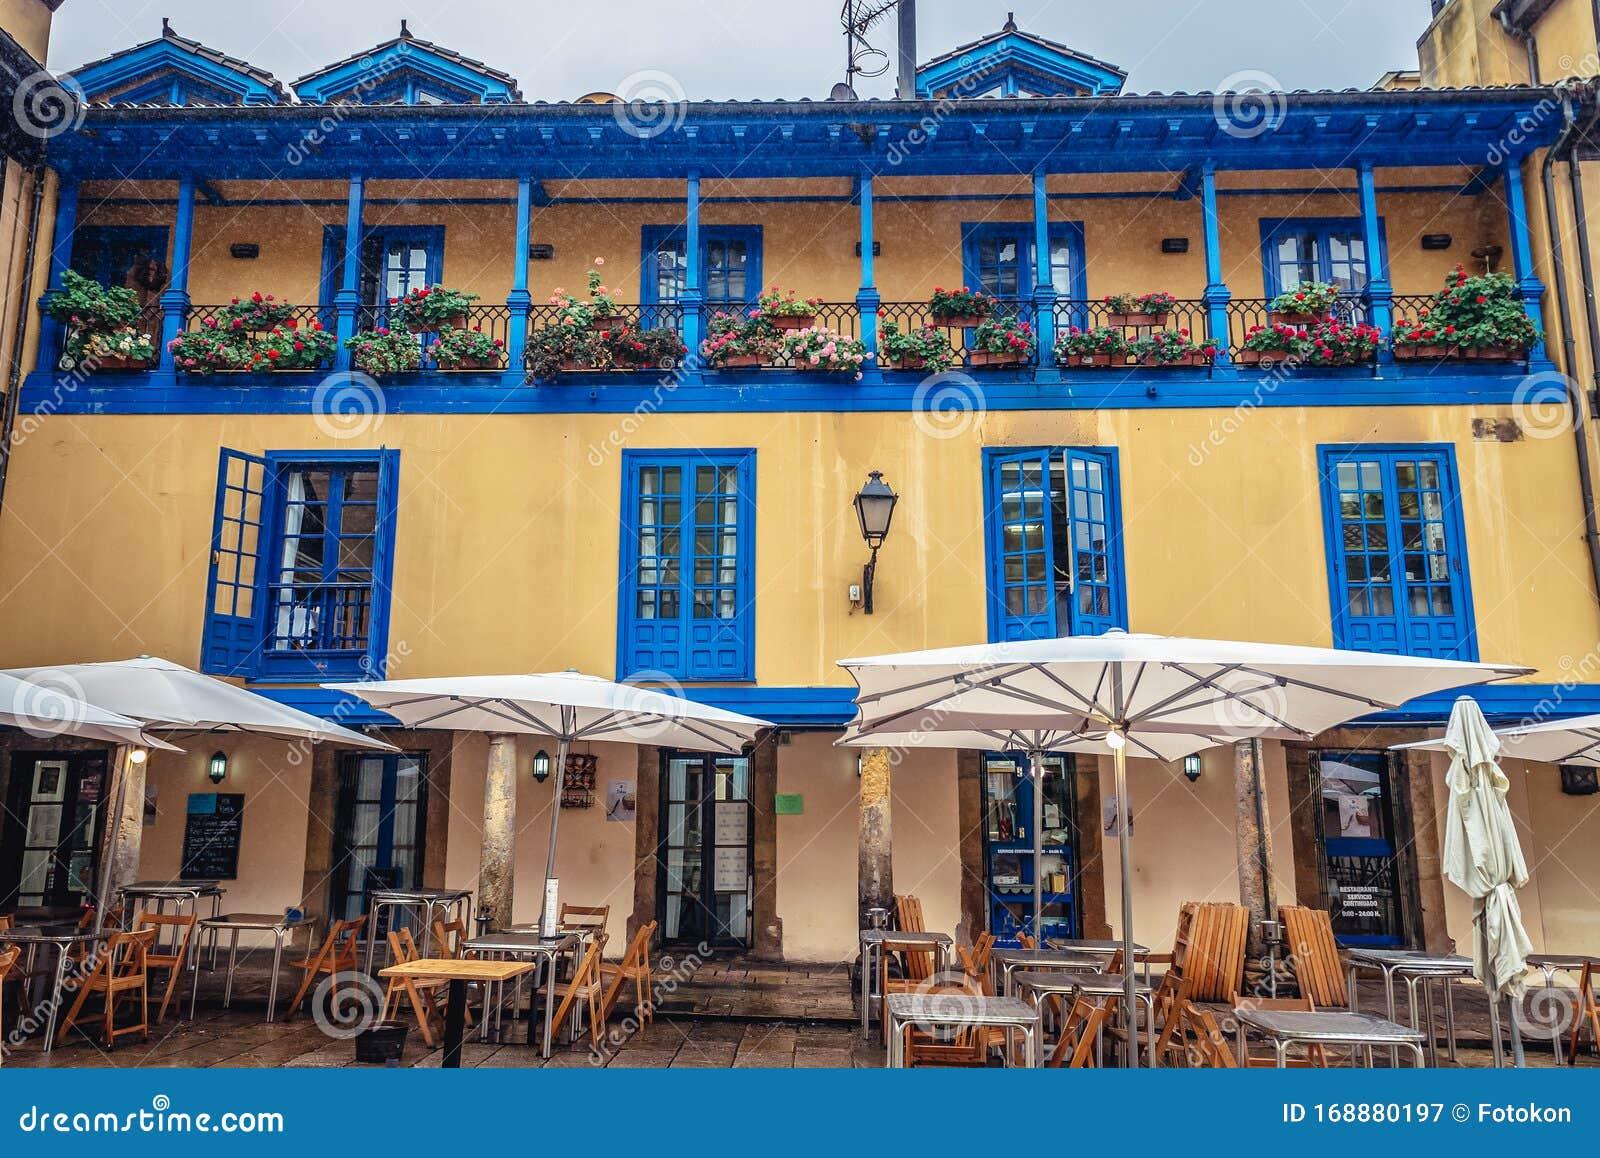 Restaurant In Oviedo Editorial Photography Image Of Asturias 168880197